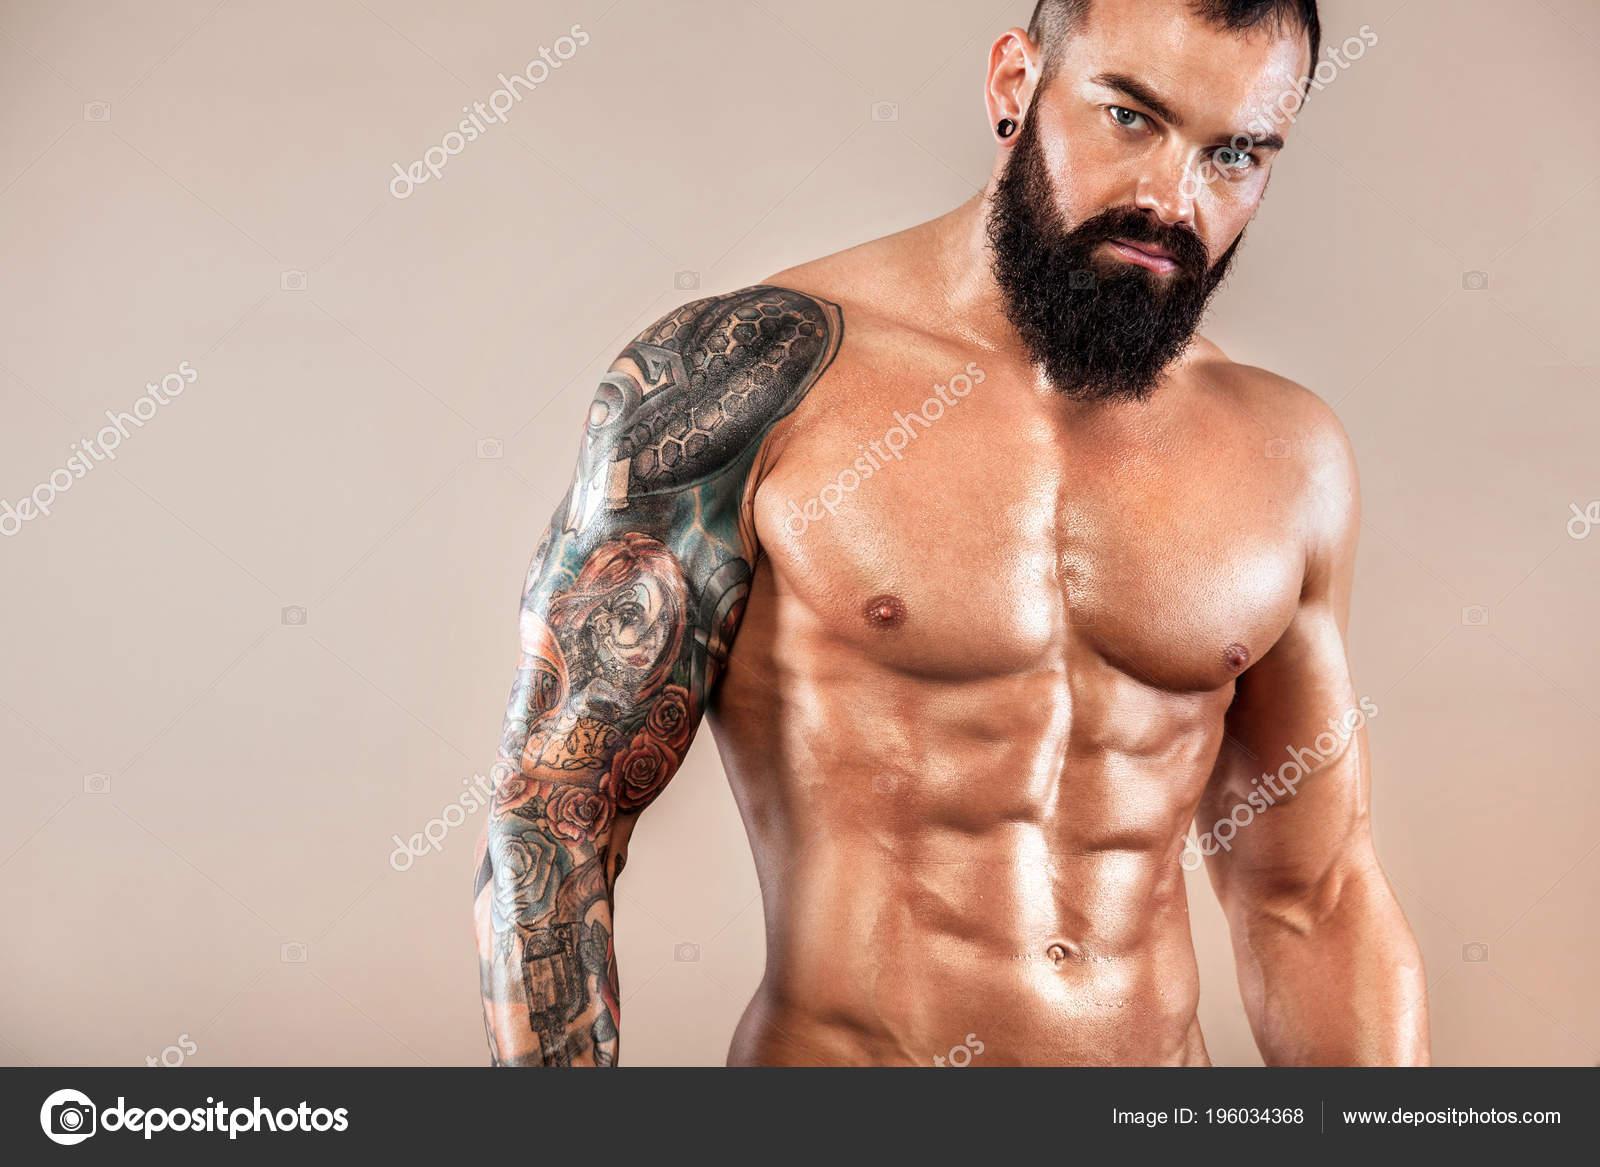 Man fit body pic